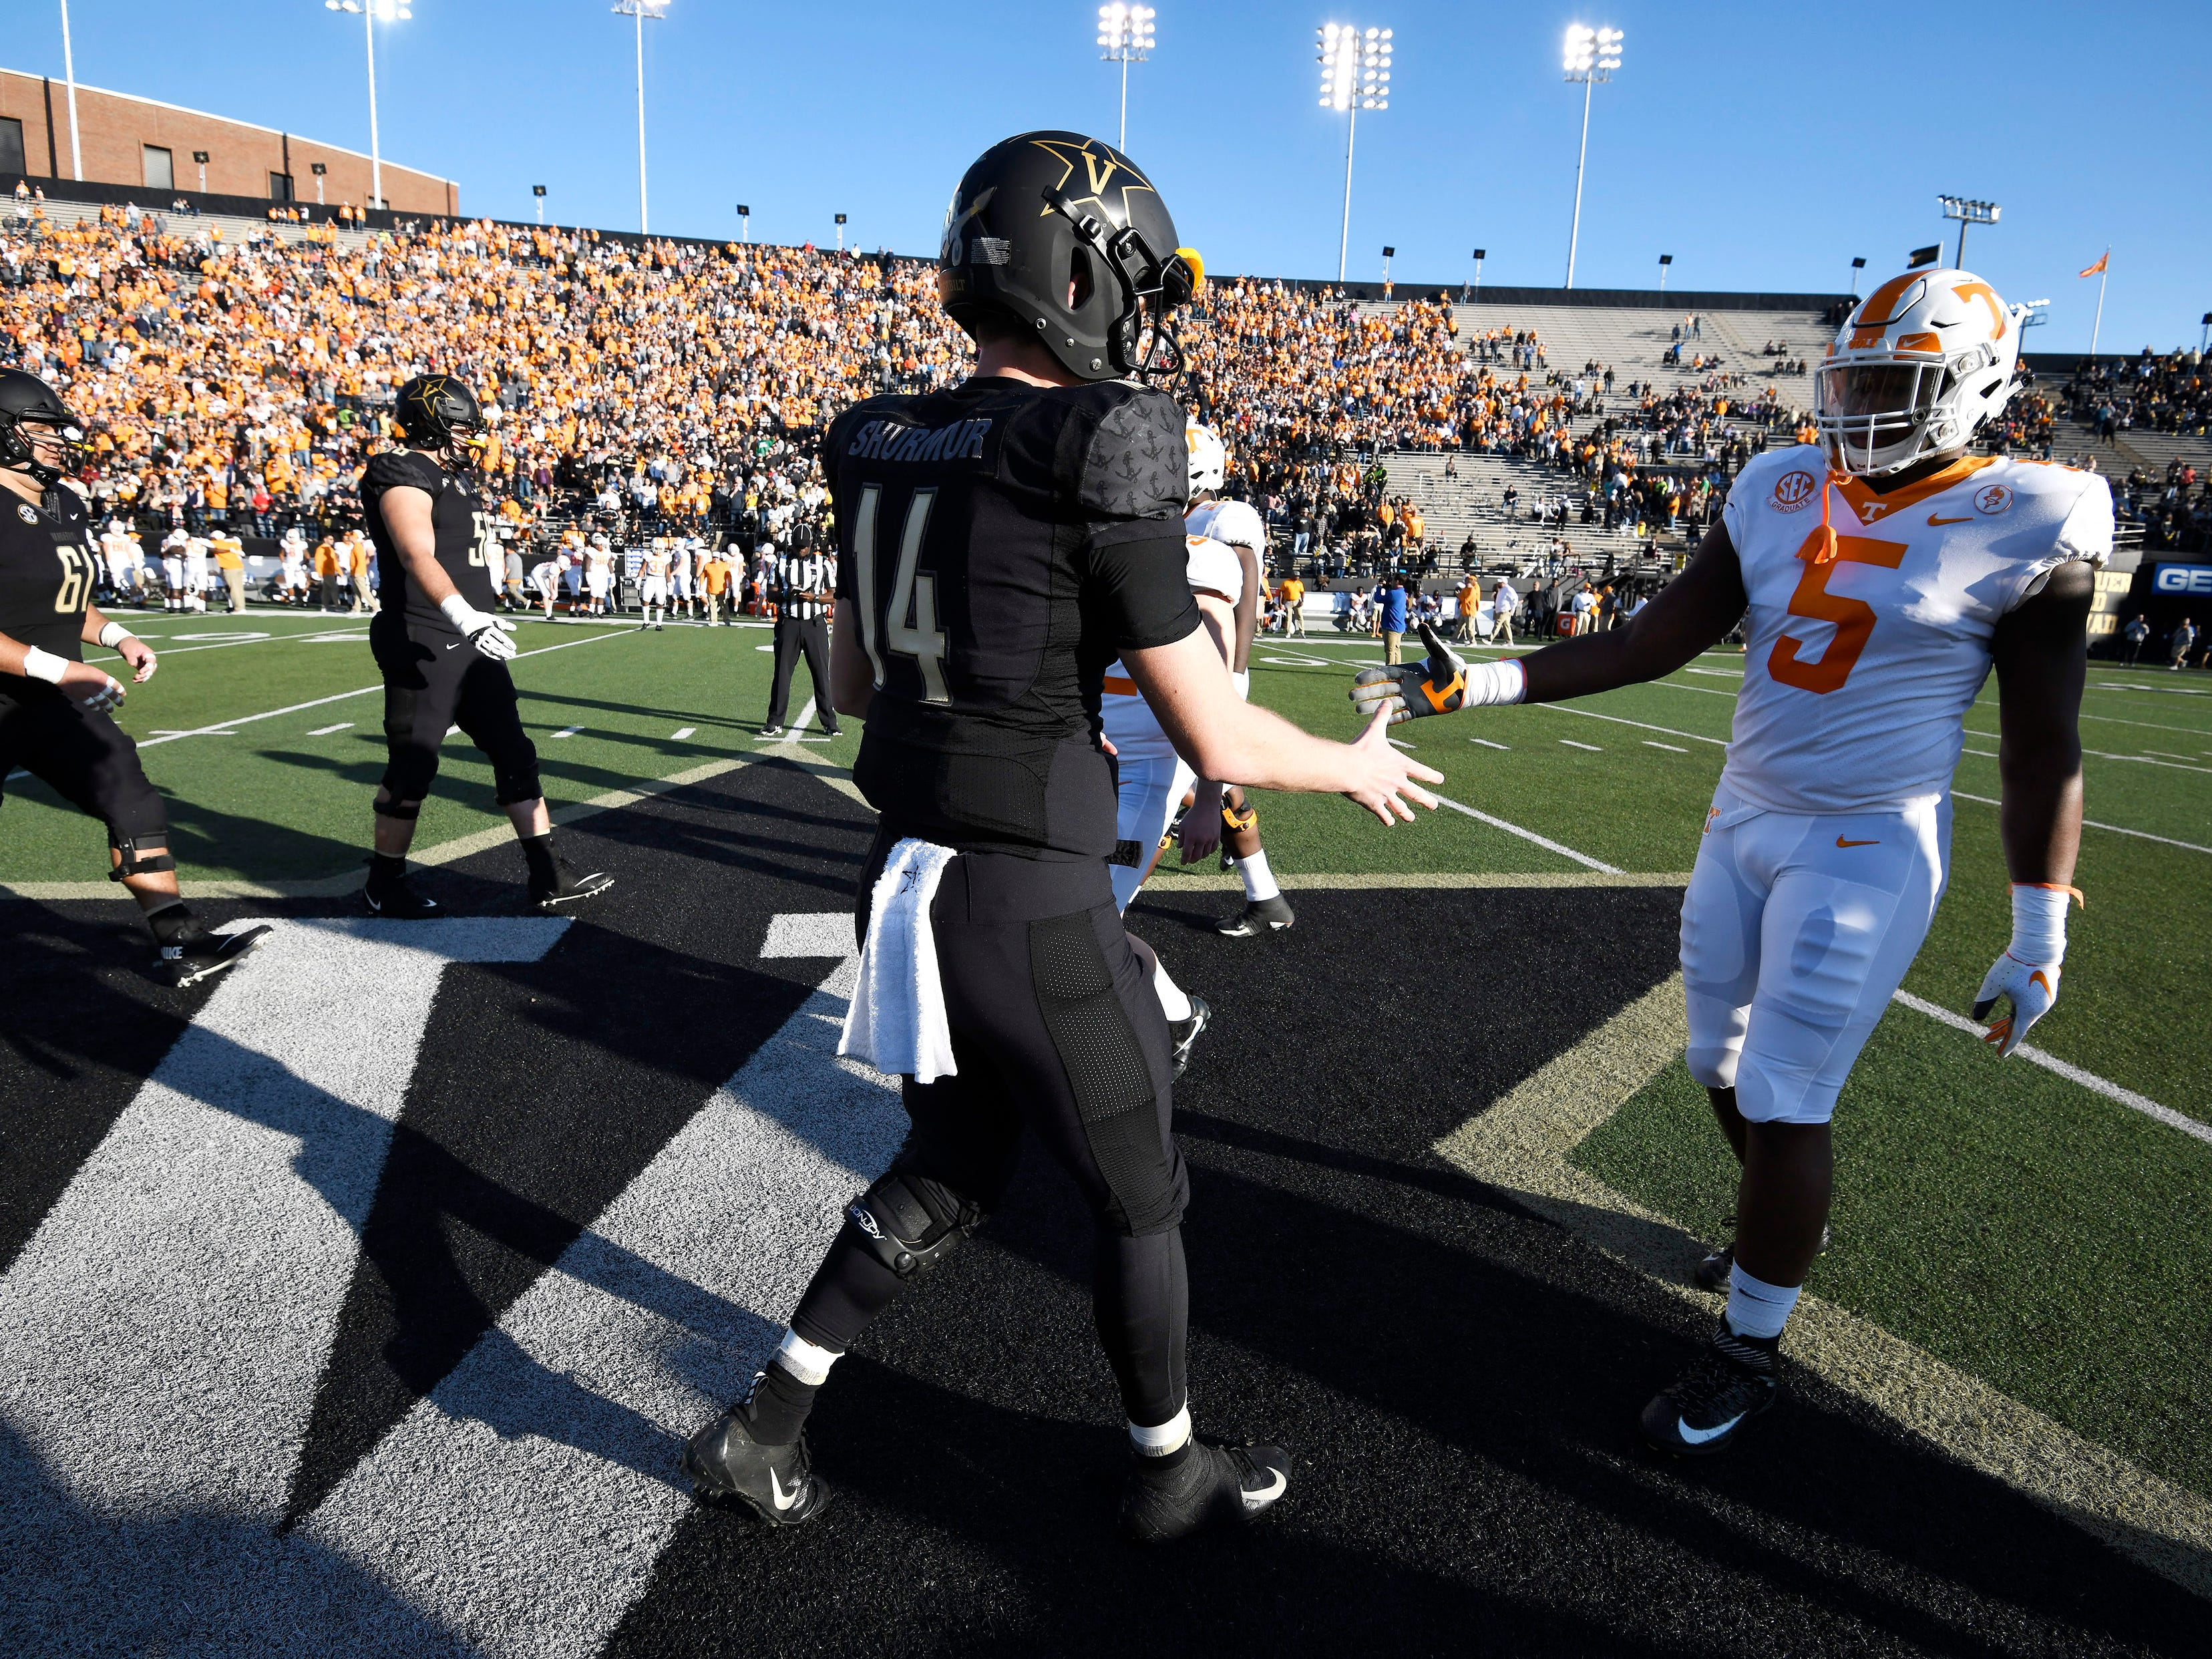 Vanderbilt quarterback Kyle Shurmur (14) and Tennessee defensive lineman Kyle Phillips (5) shake hands before the game at Vanderbilt Stadium Saturday, Nov. 24, 2018, in Nashville, Tenn.